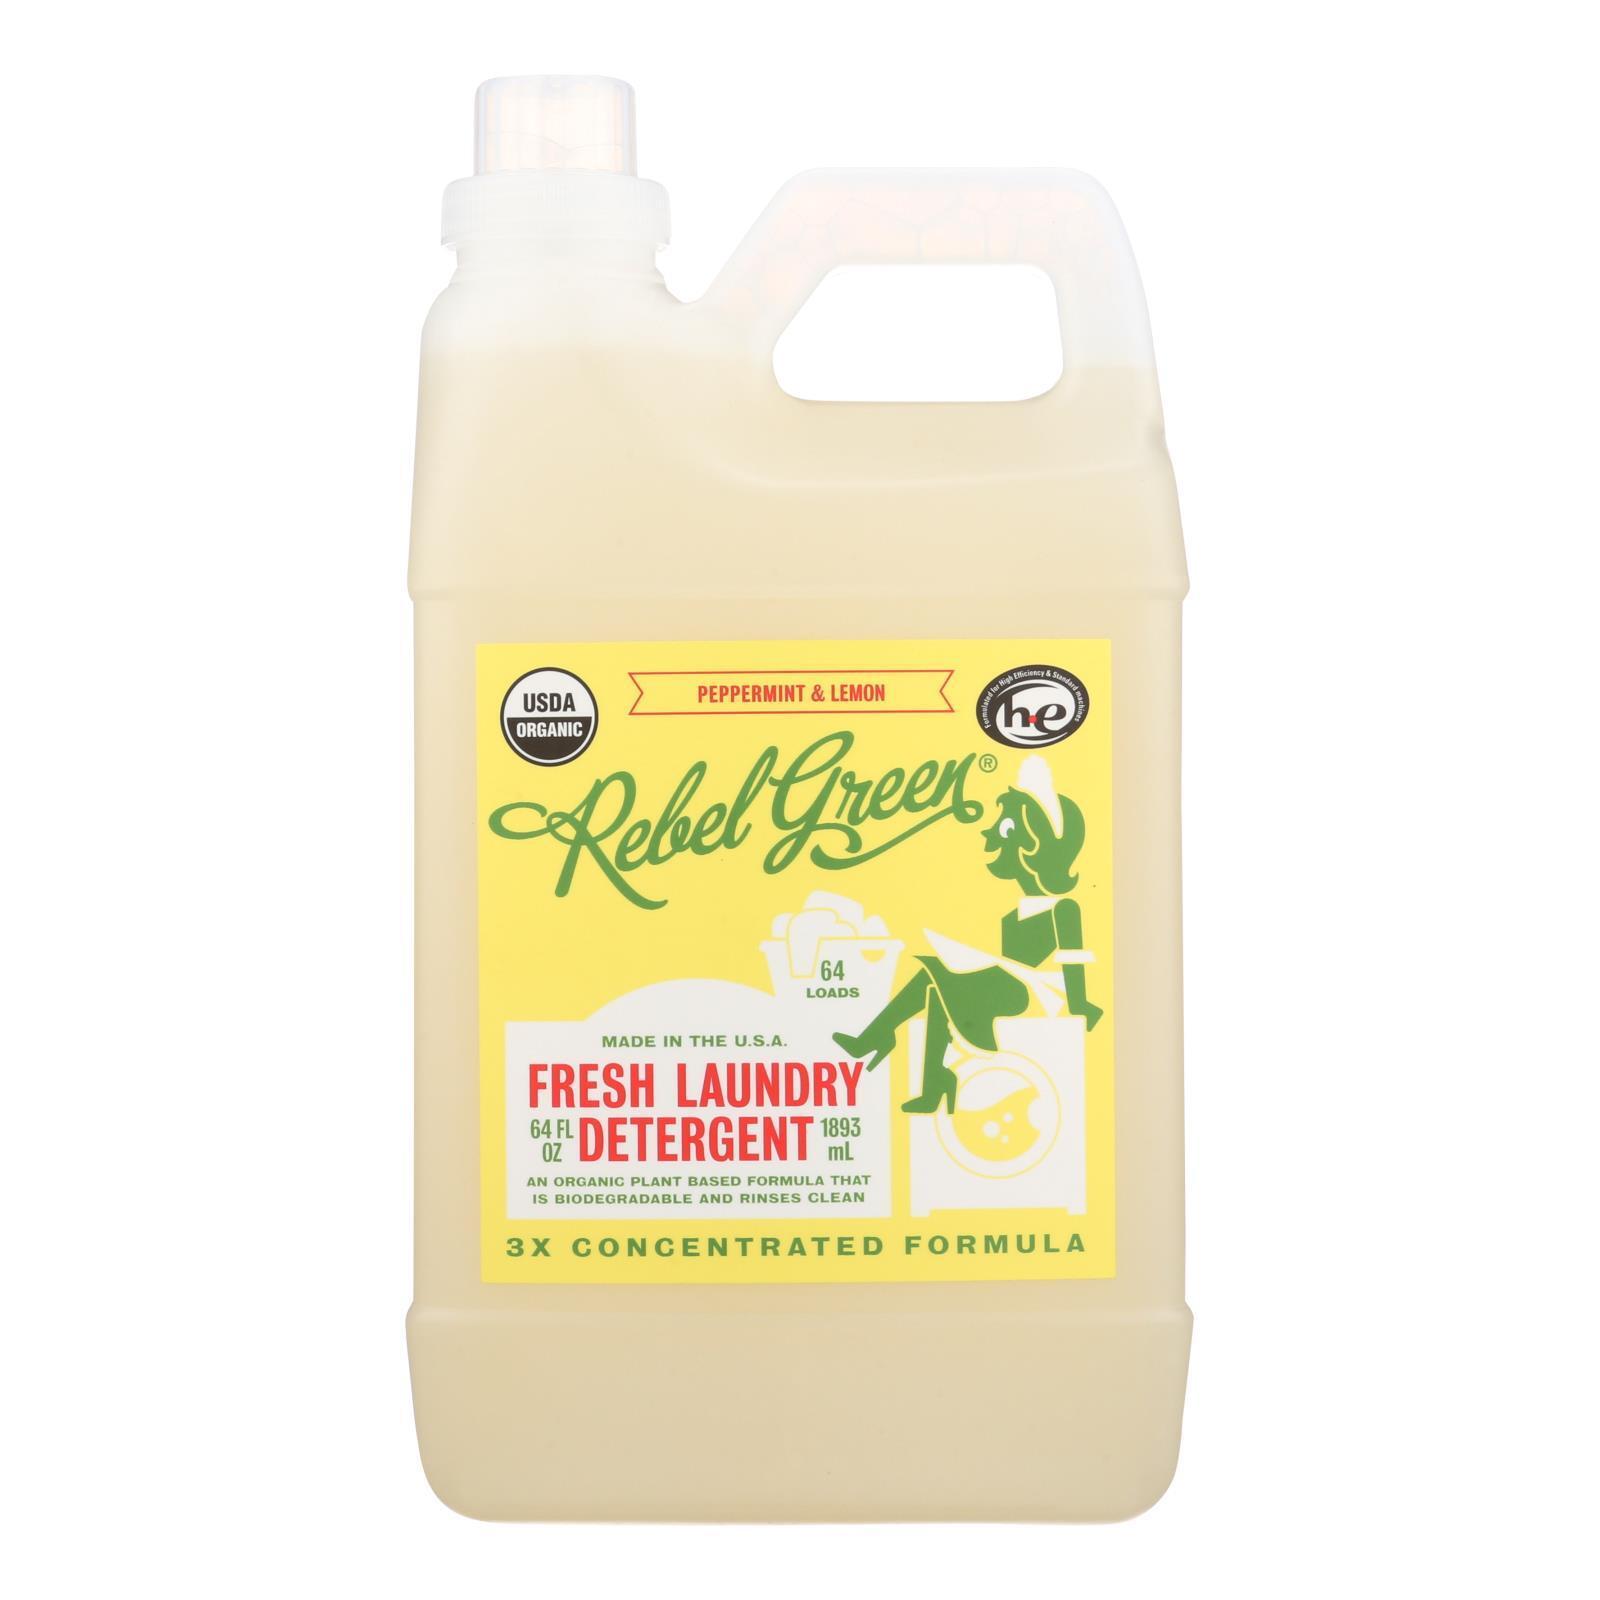 Rebel Green Laundry Detergent - Organic - Peppermint and Lemon - Case of 4 - 64 fl oz